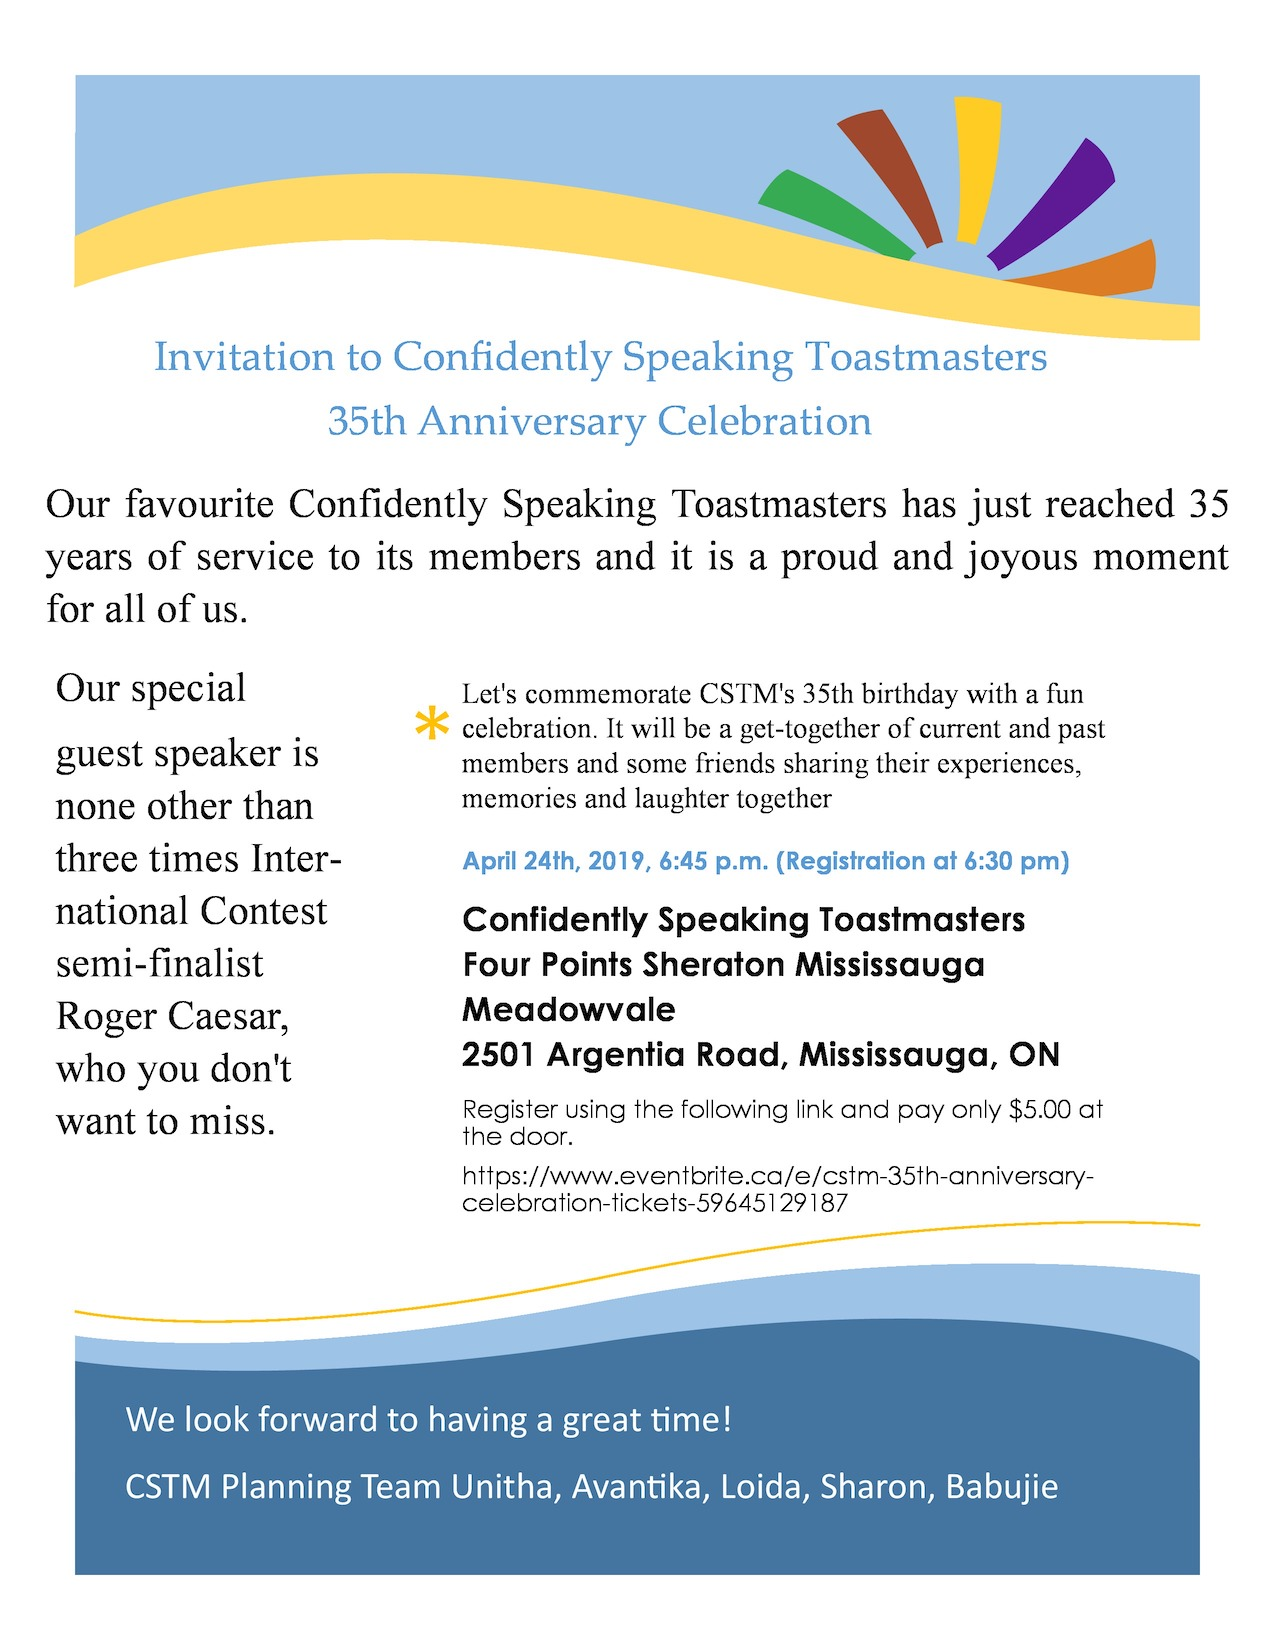 Invitation for CSTM 35th Anniversary